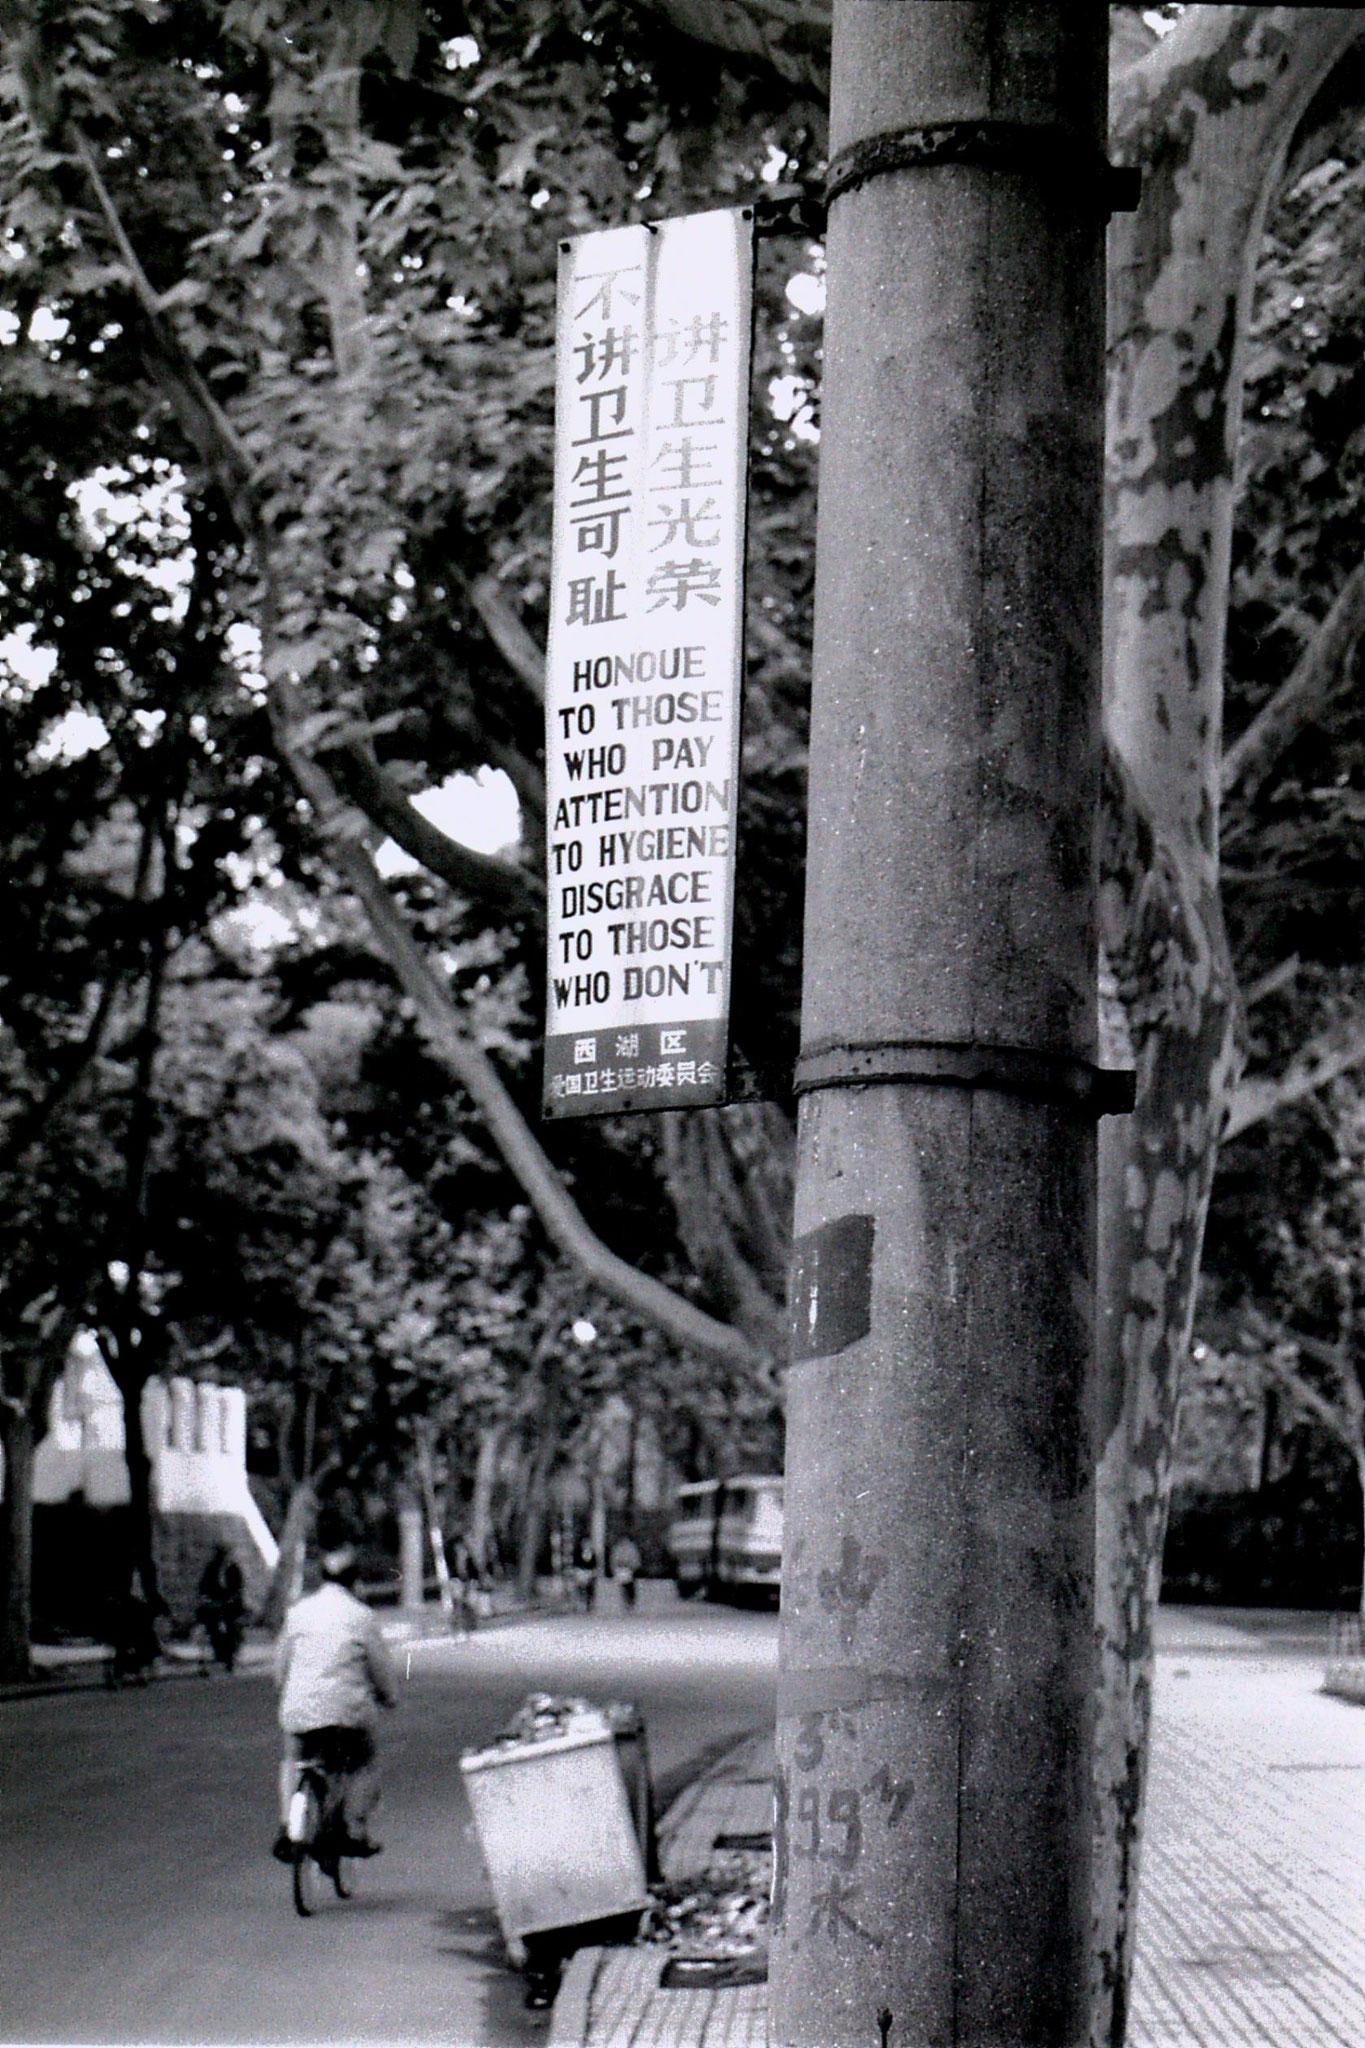 29/5/1989: 8